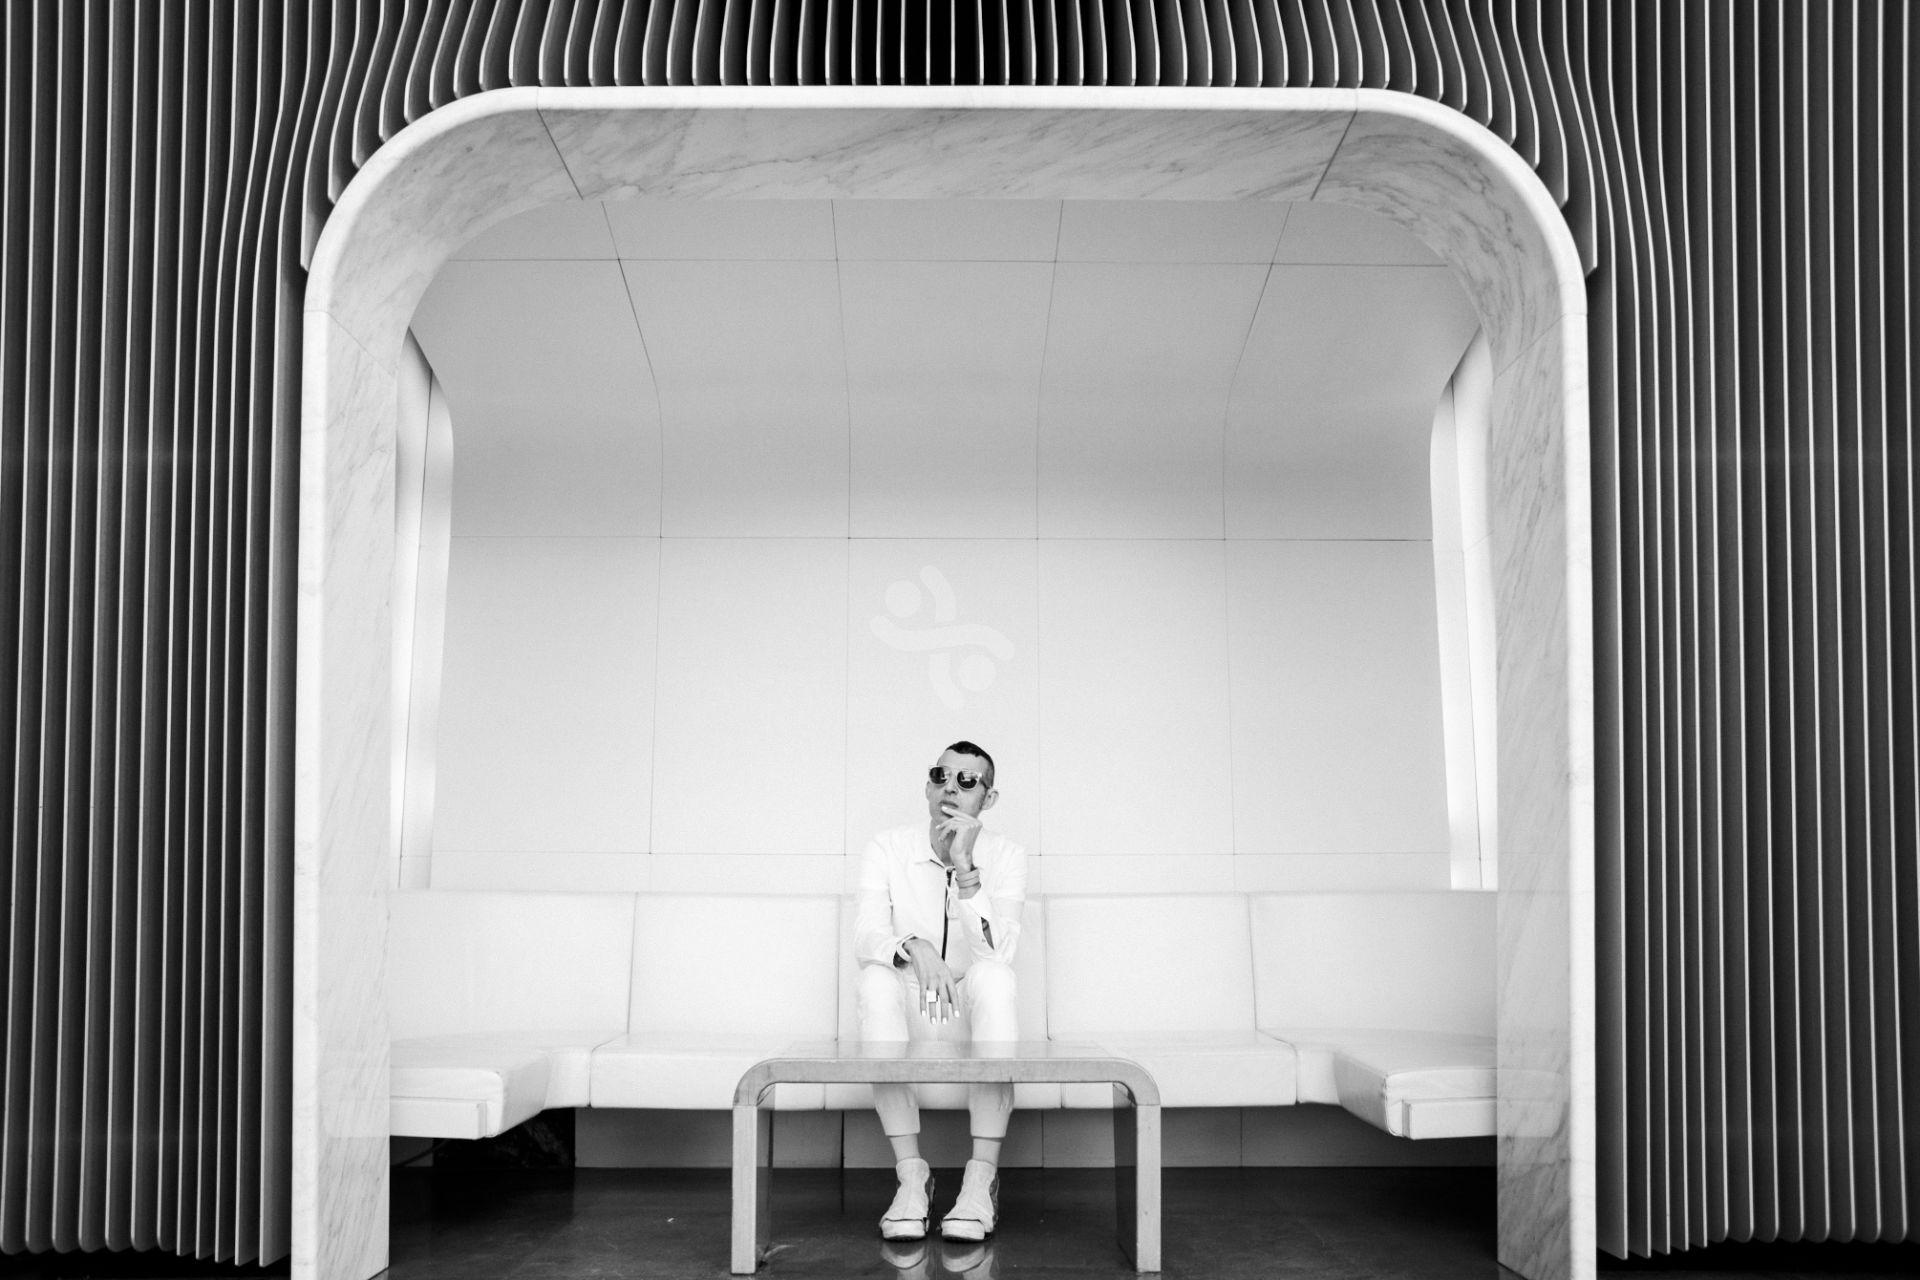 Karim Rashid – 24hugs slings designer